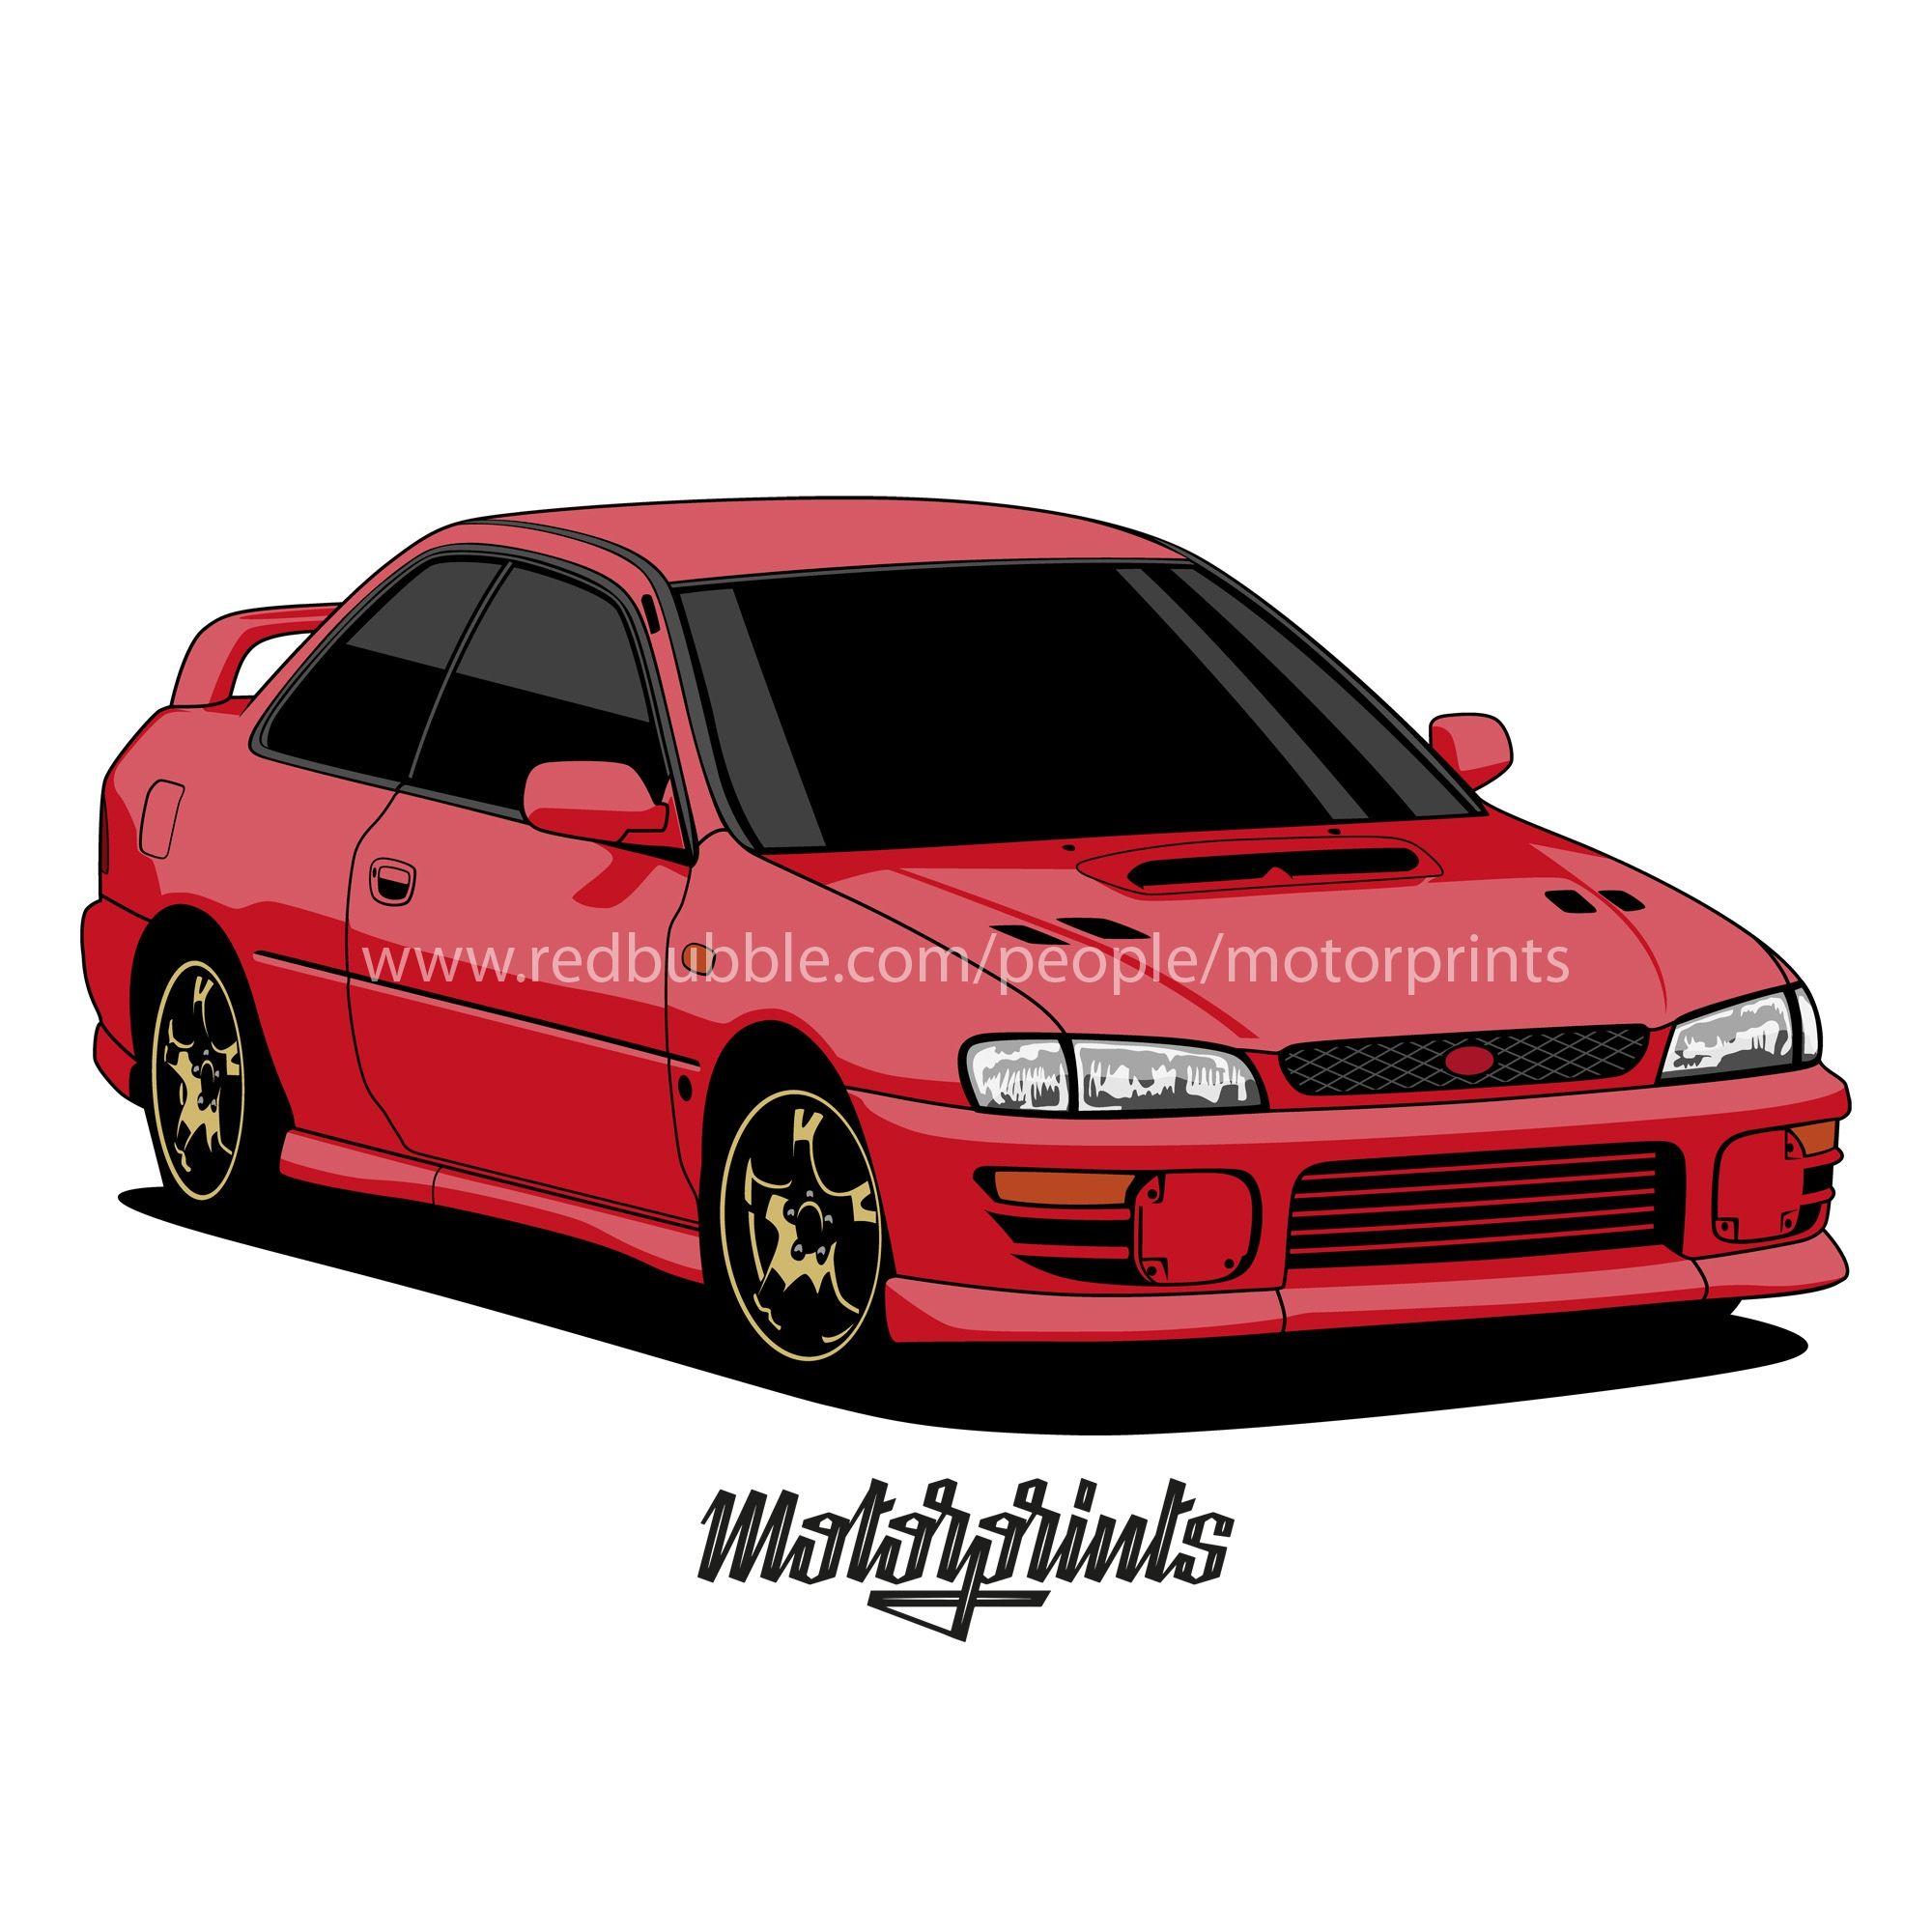 Subaru Impreza Wrx Sti Motorprints Gifts & Merchandise